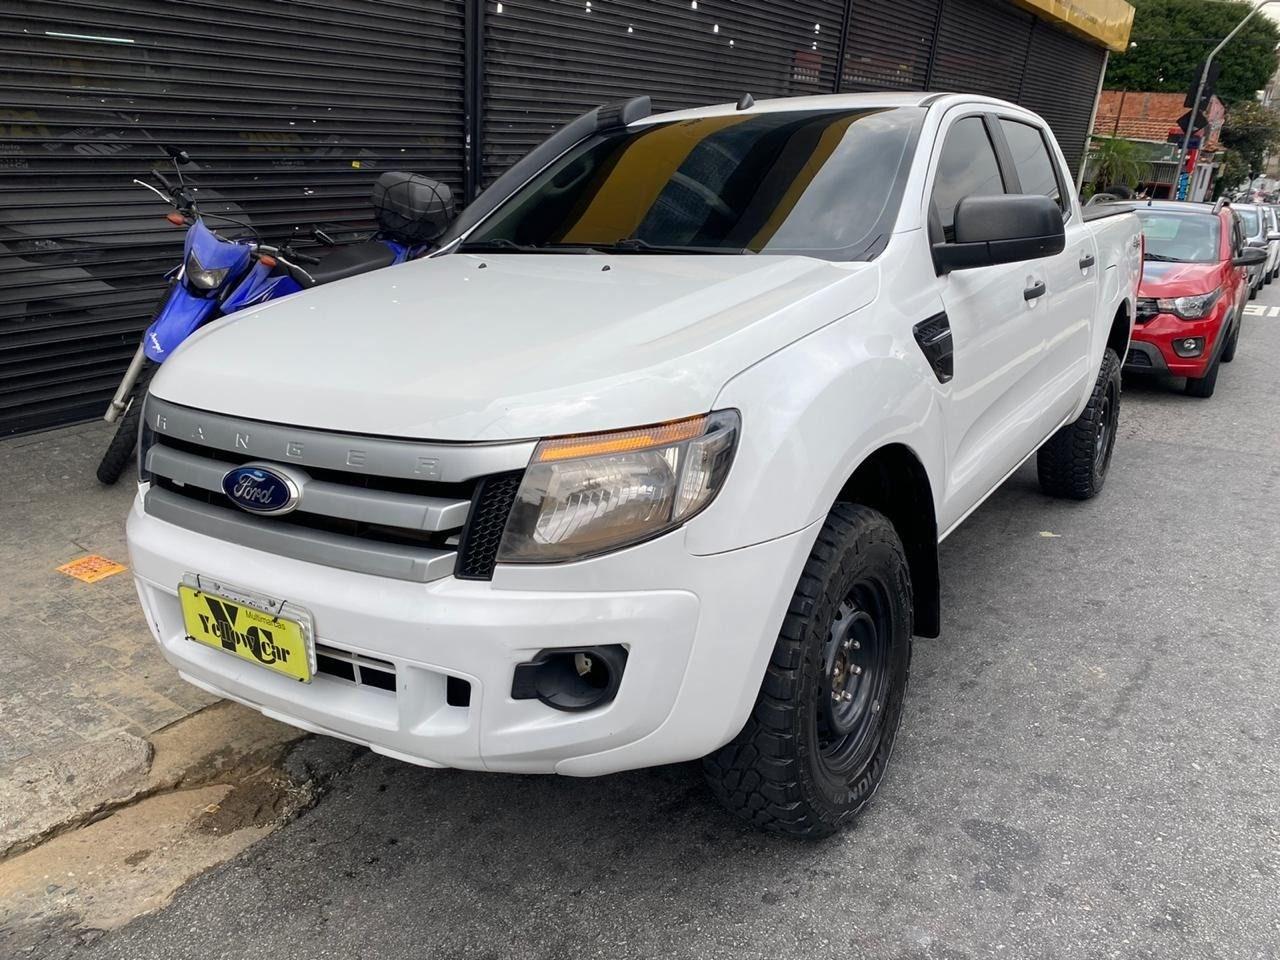 //www.autoline.com.br/carro/ford/ranger-22-cd-xl-16v-diesel-4p-4x4-turbo-manual/2013/sao-paulo-sp/14120970